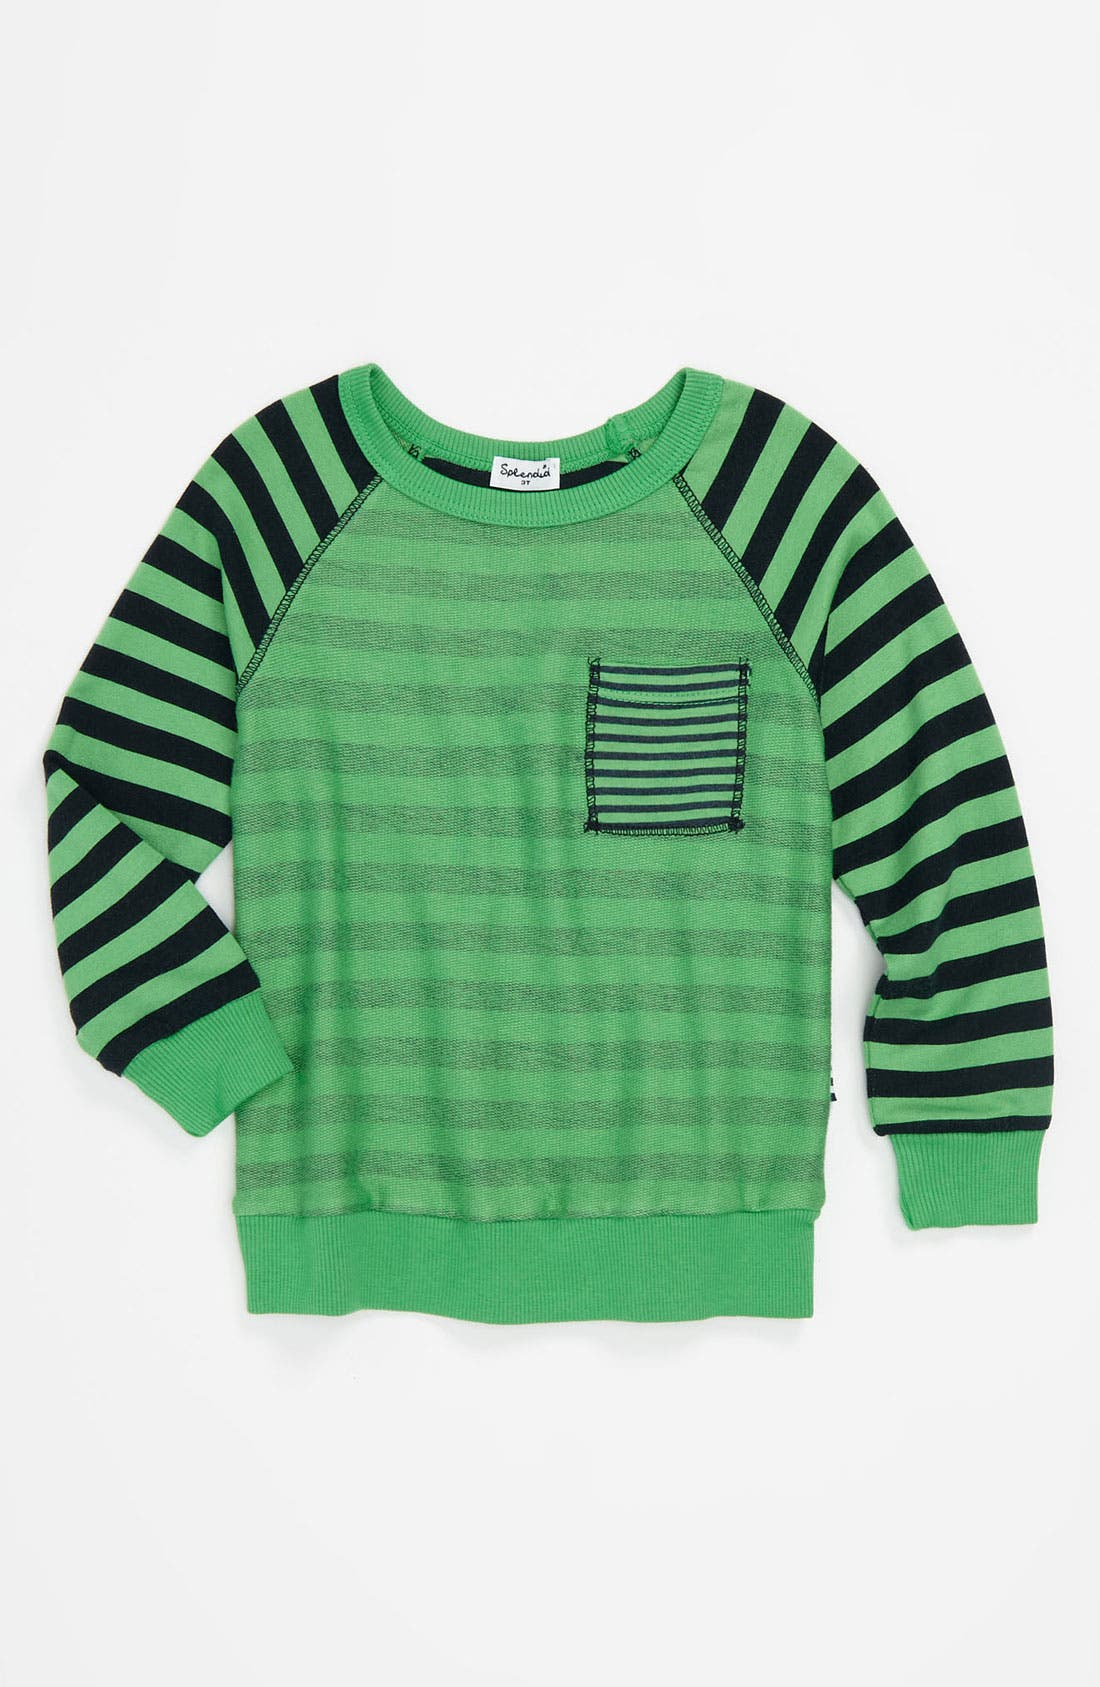 Alternate Image 1 Selected - Splendid Raglan Sleeve Shirt (Toddler)